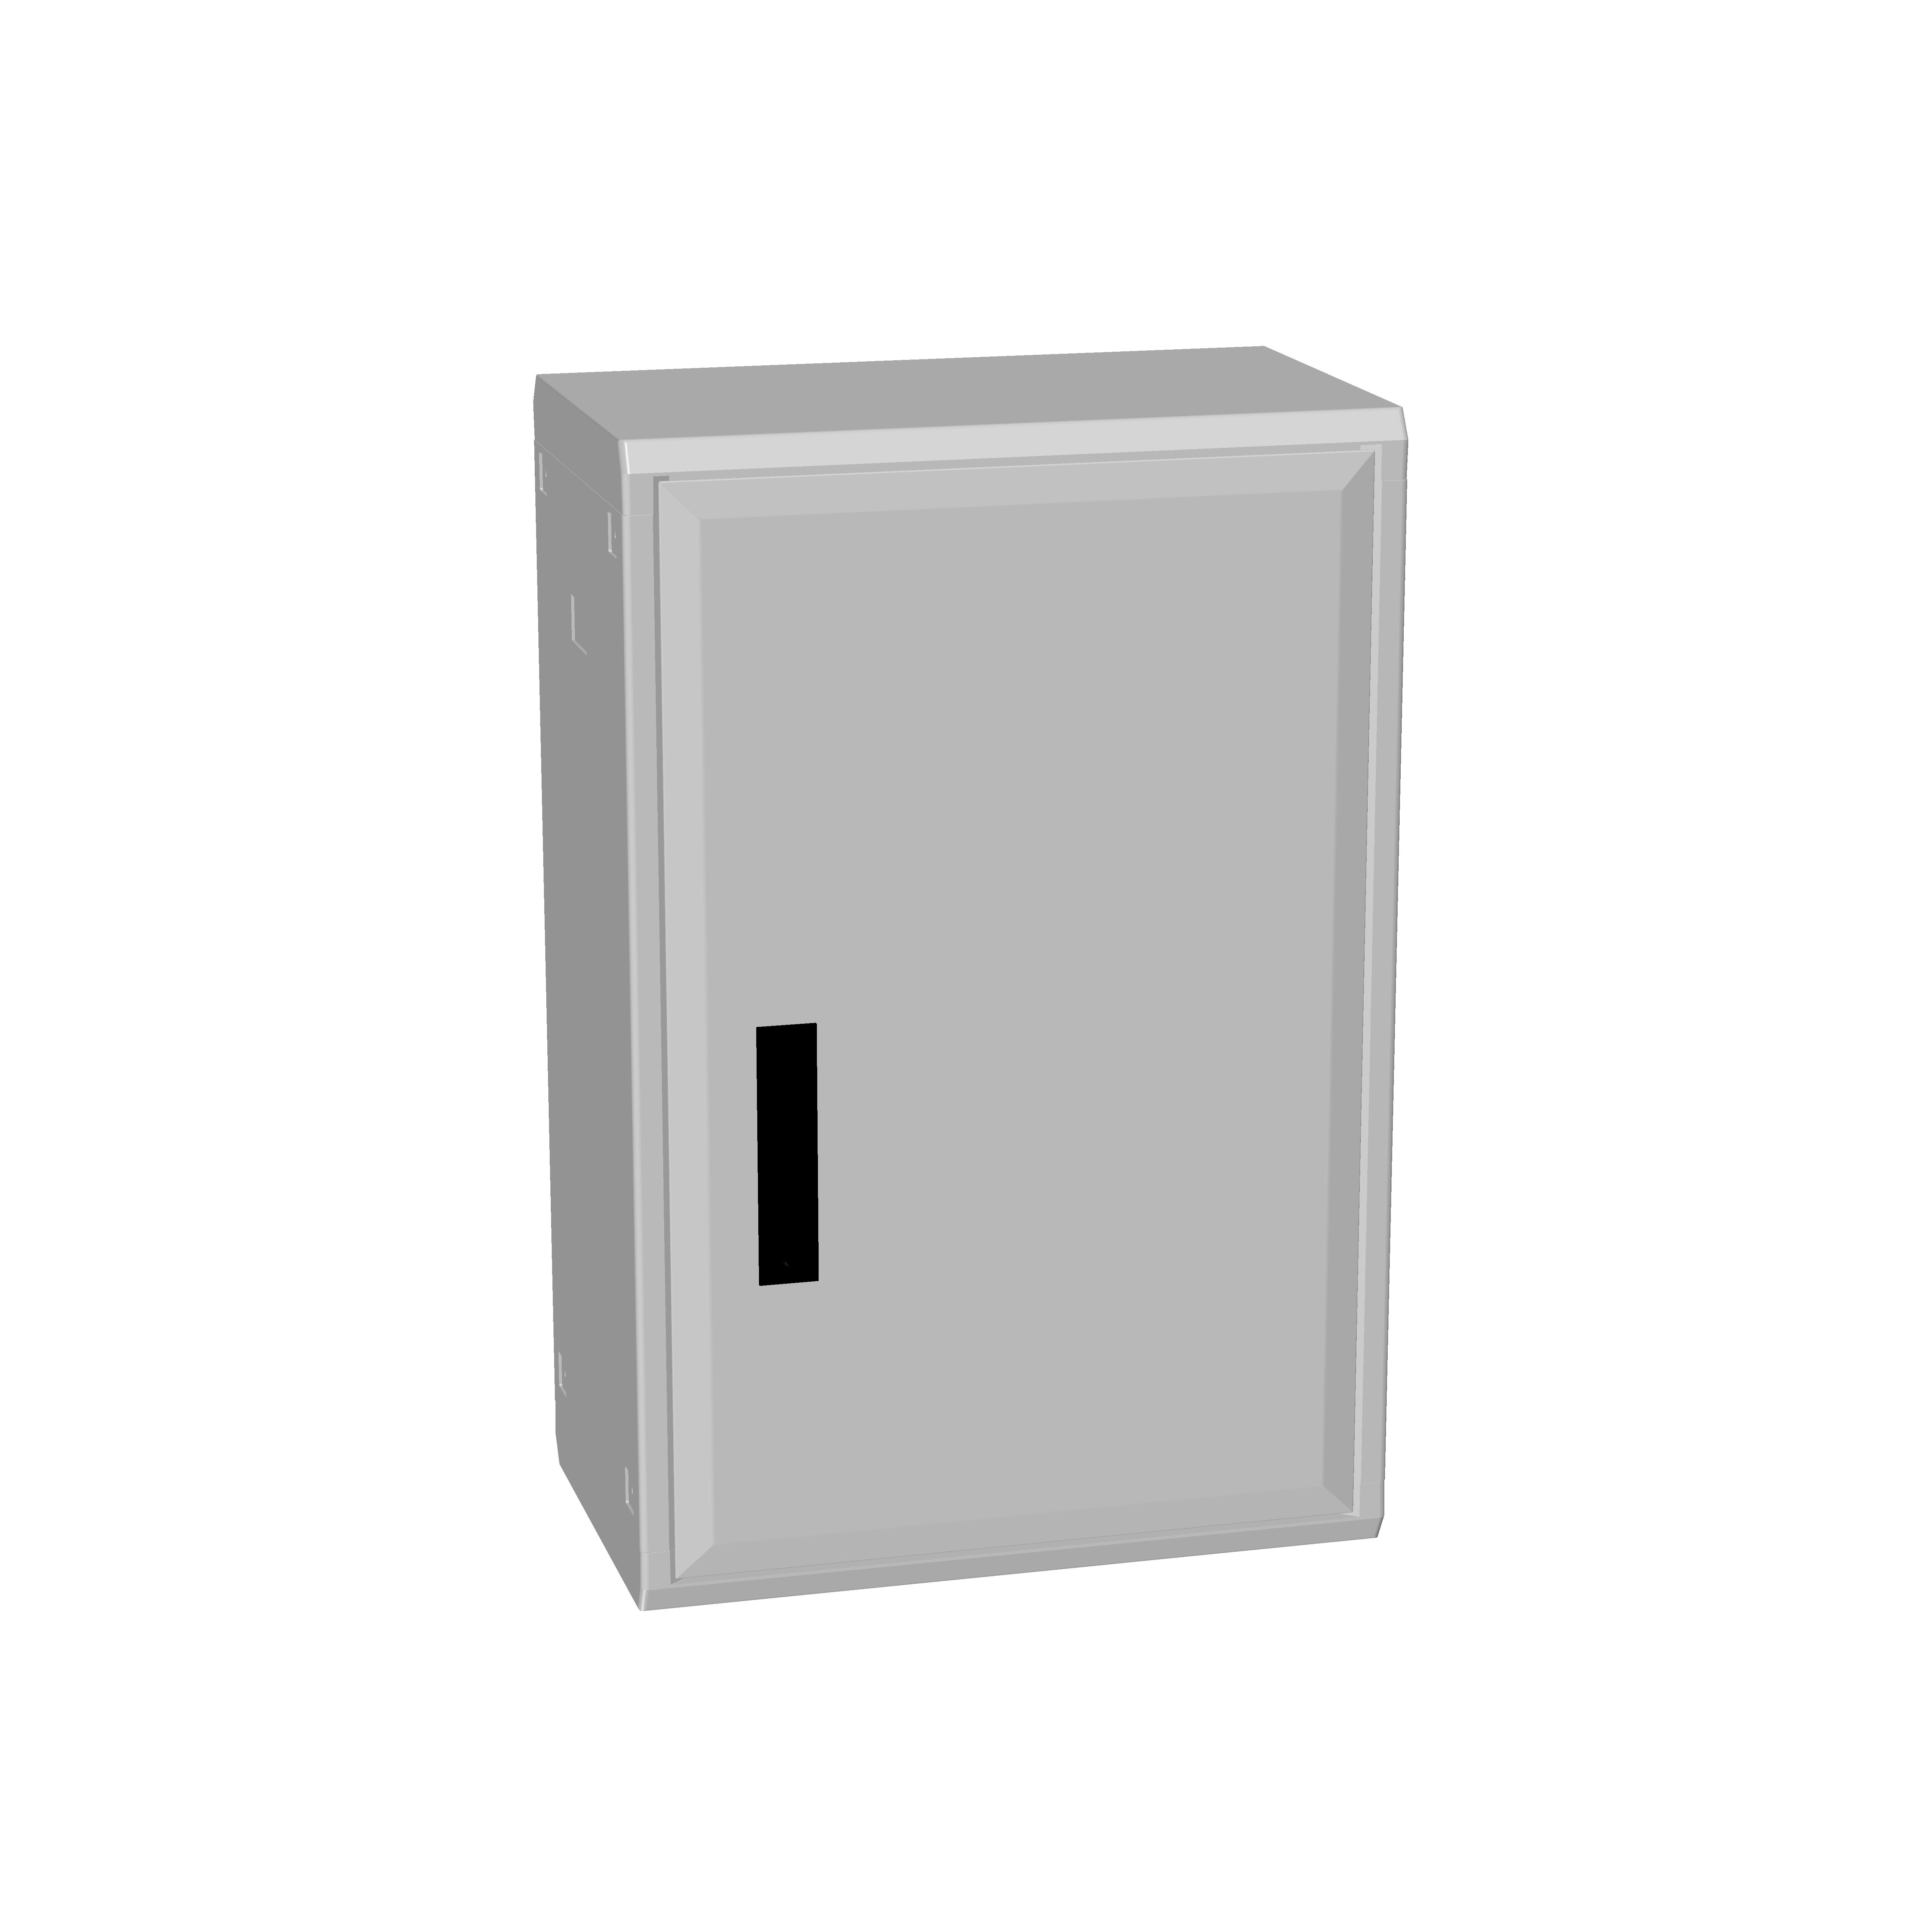 1 Stk Polyesterschrank, eintürig, 750x500x312 POCC3230--